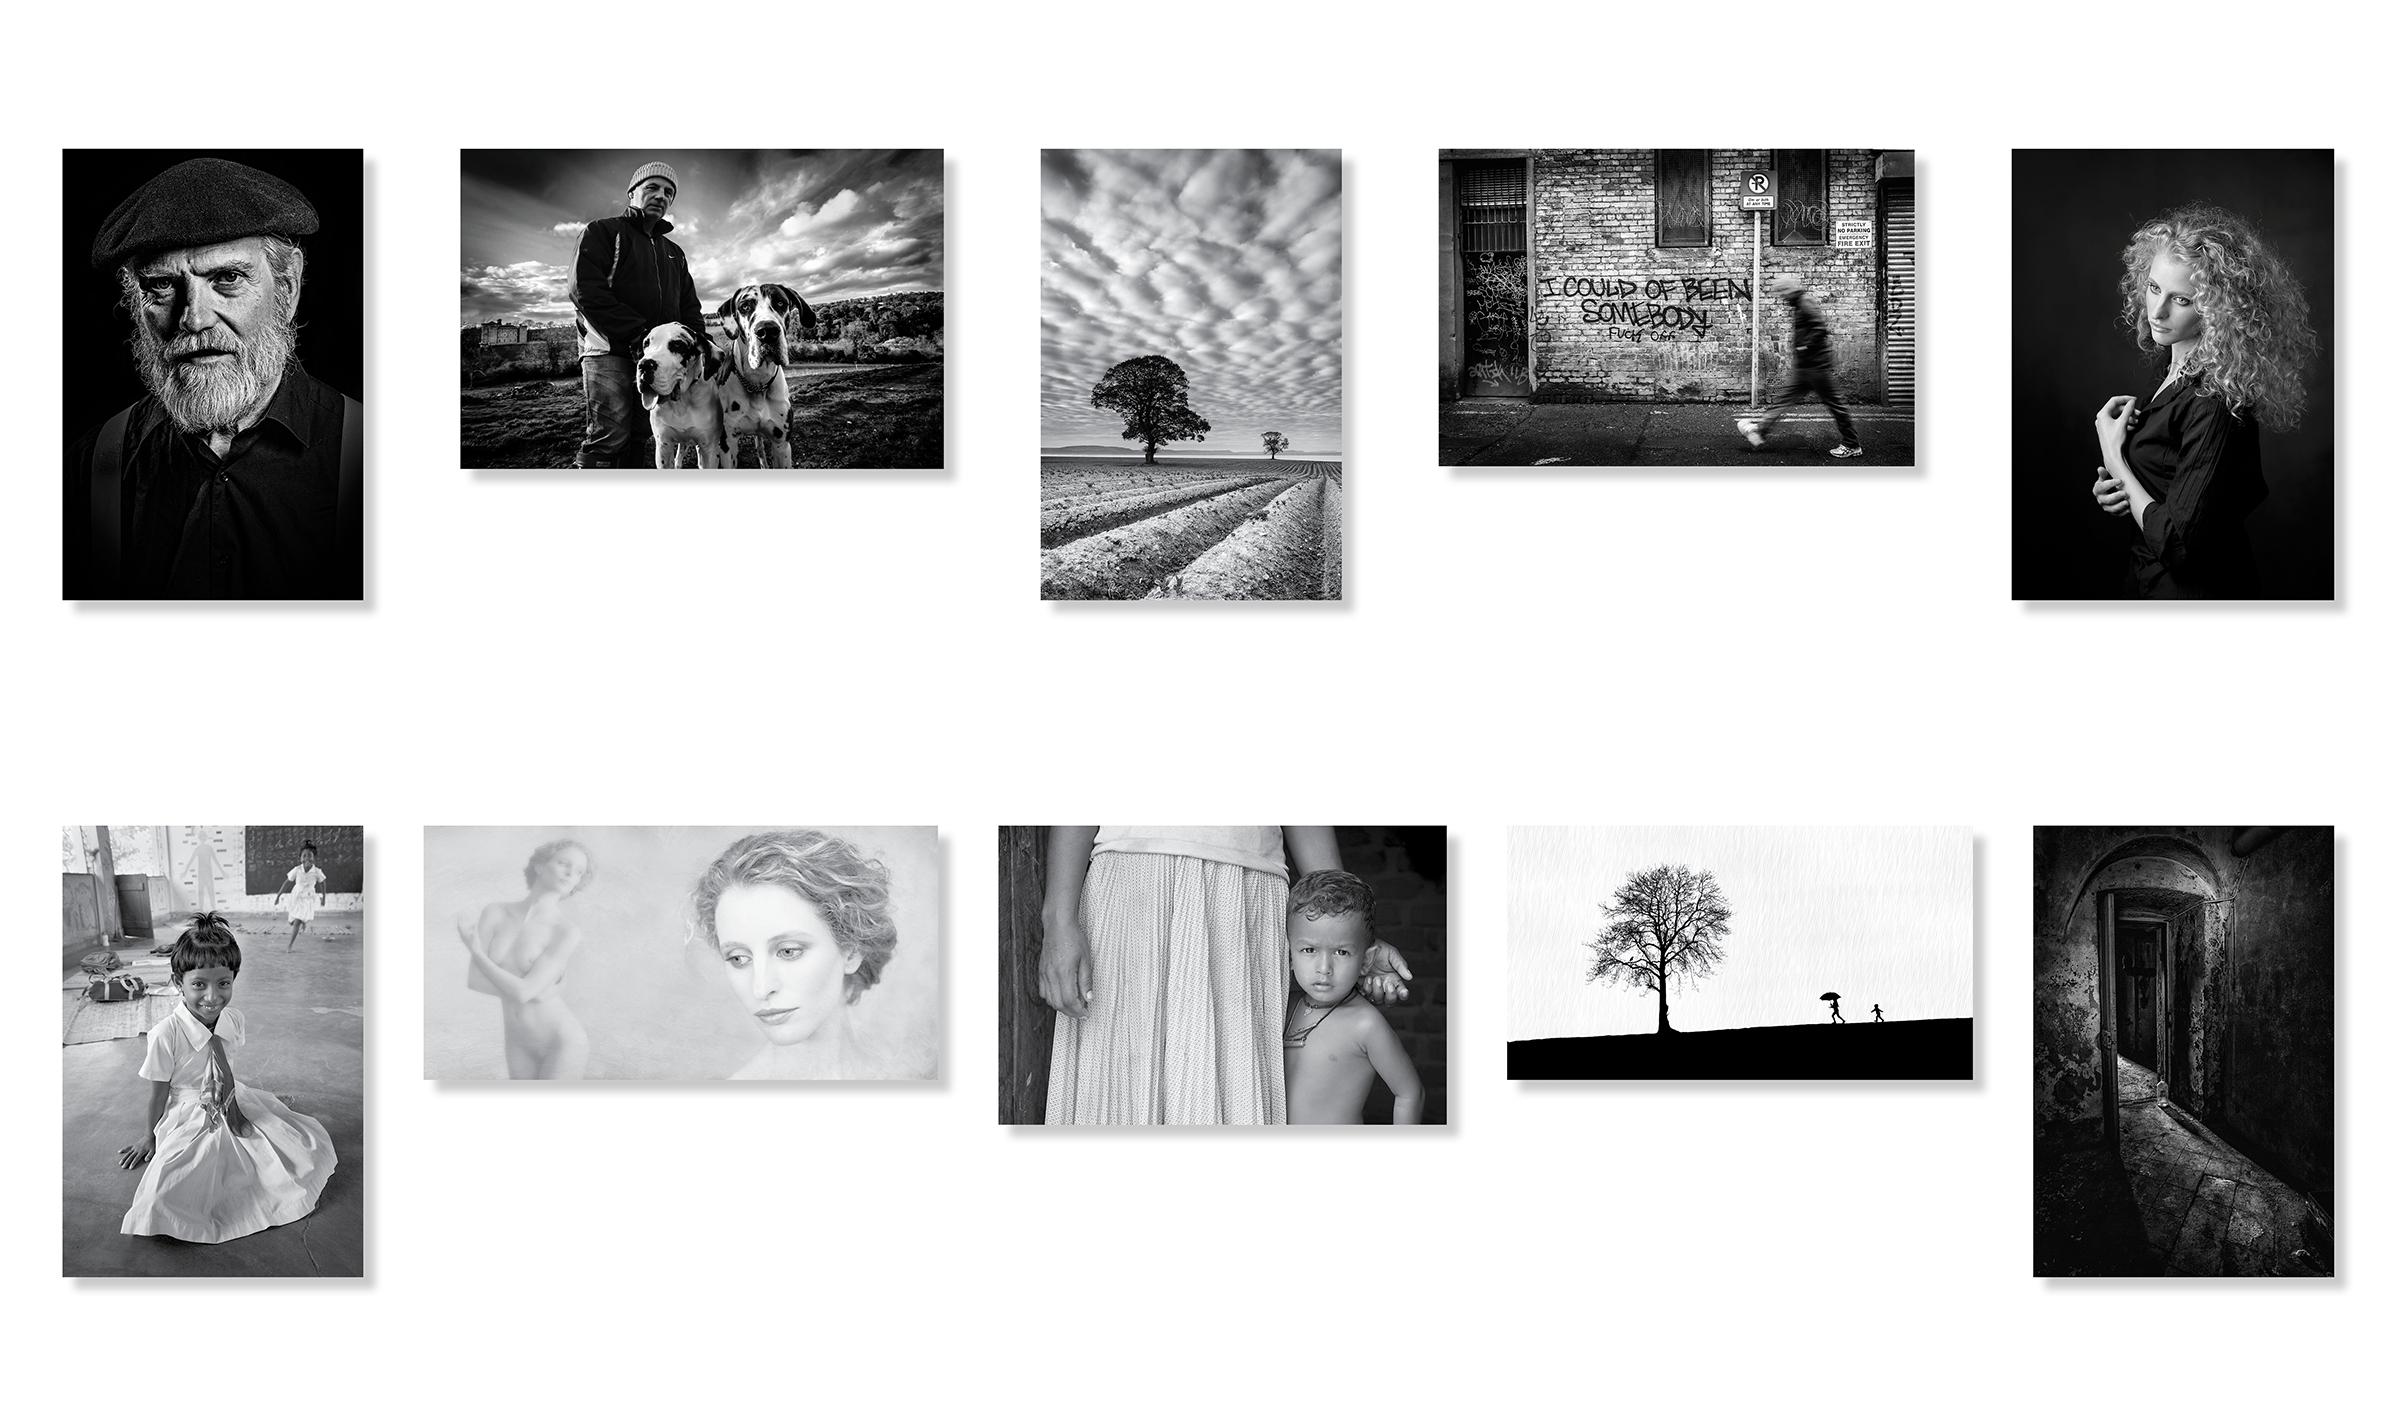 H - Mid Louth Camera Club - Mono